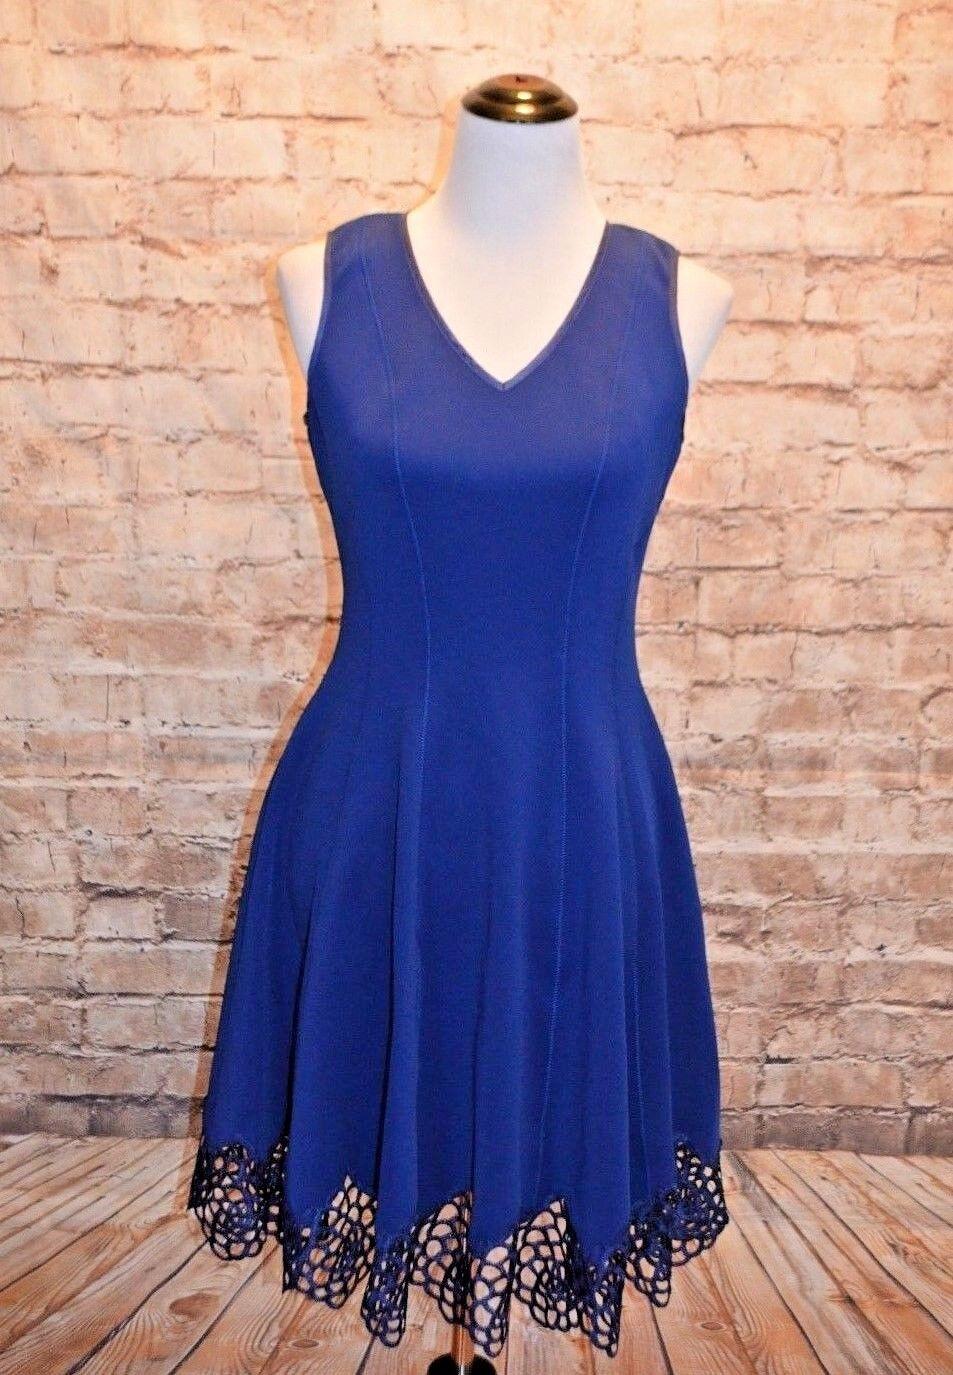 Modcloth Do's & Dotes Dress NWOT 8  140 Sapphire bluee lace hem neoprene